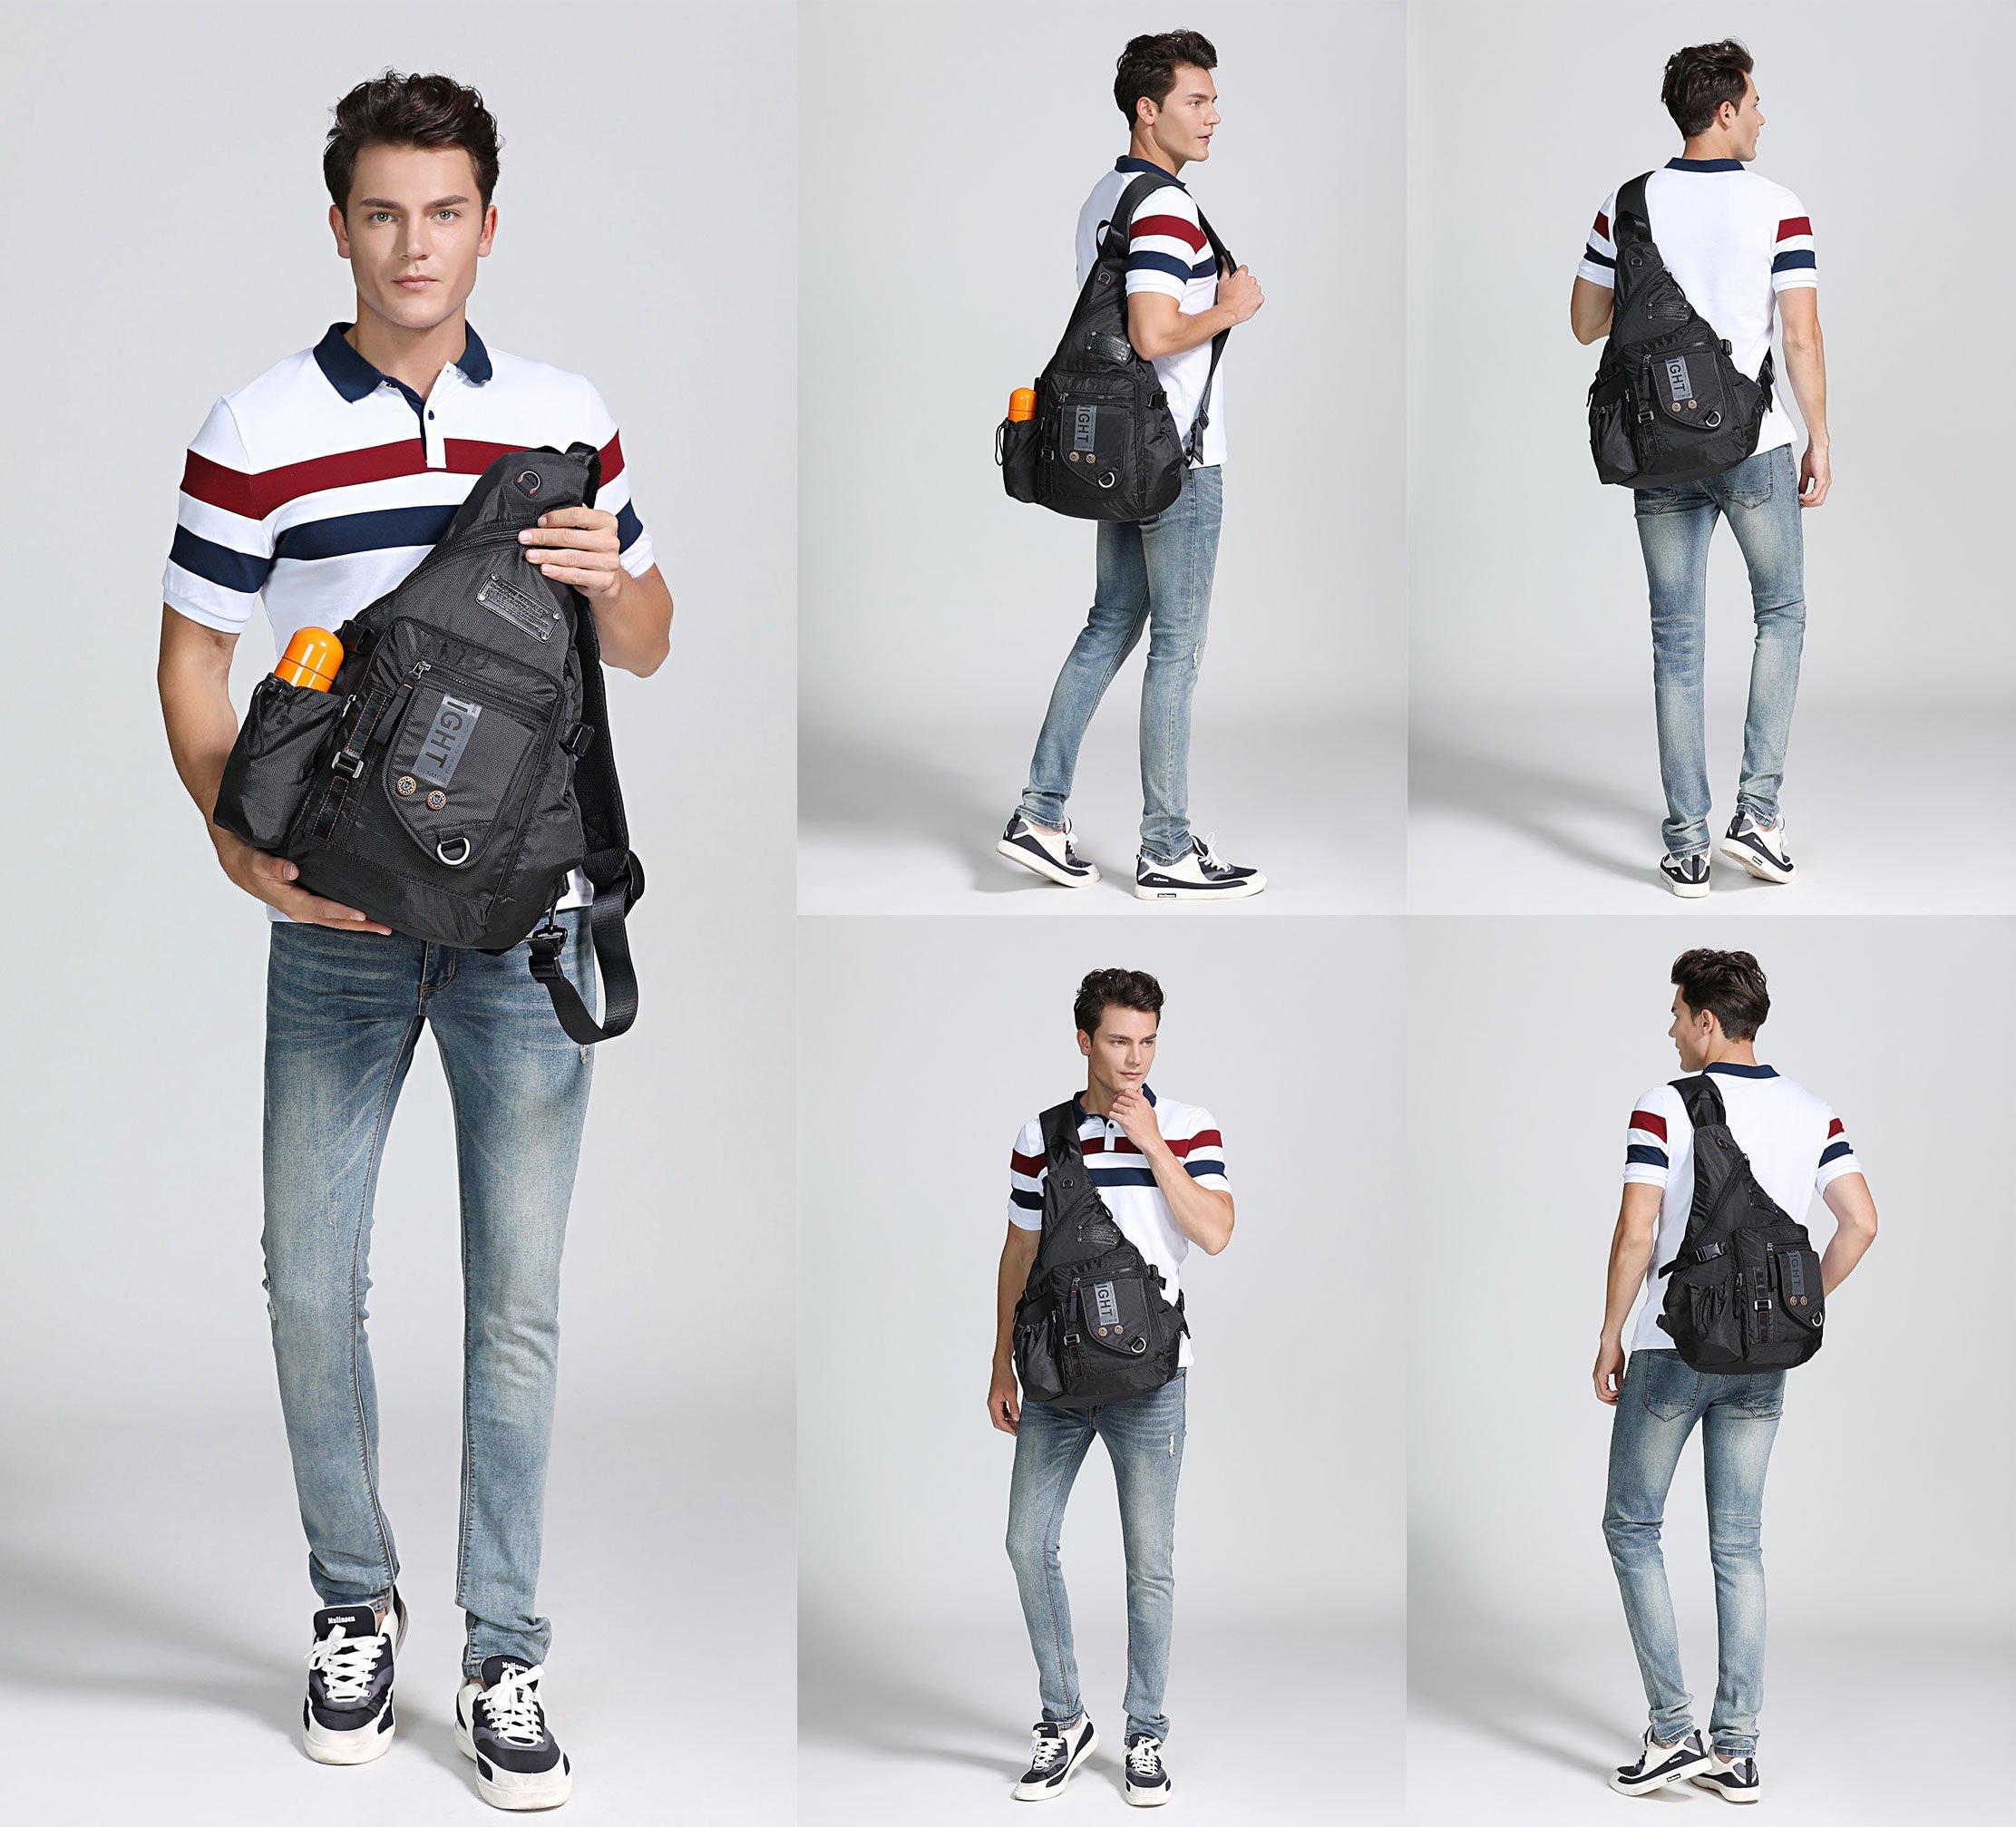 c766eb07c2 DDDH Large Sling Bags Crossbody Backpack 14.1-Inch Chest Daypack Travel Bag  Book Bag for Men Women(Grey) - LYSB01LMW87BI-OFFSUPPLIES   Shops    Clothing